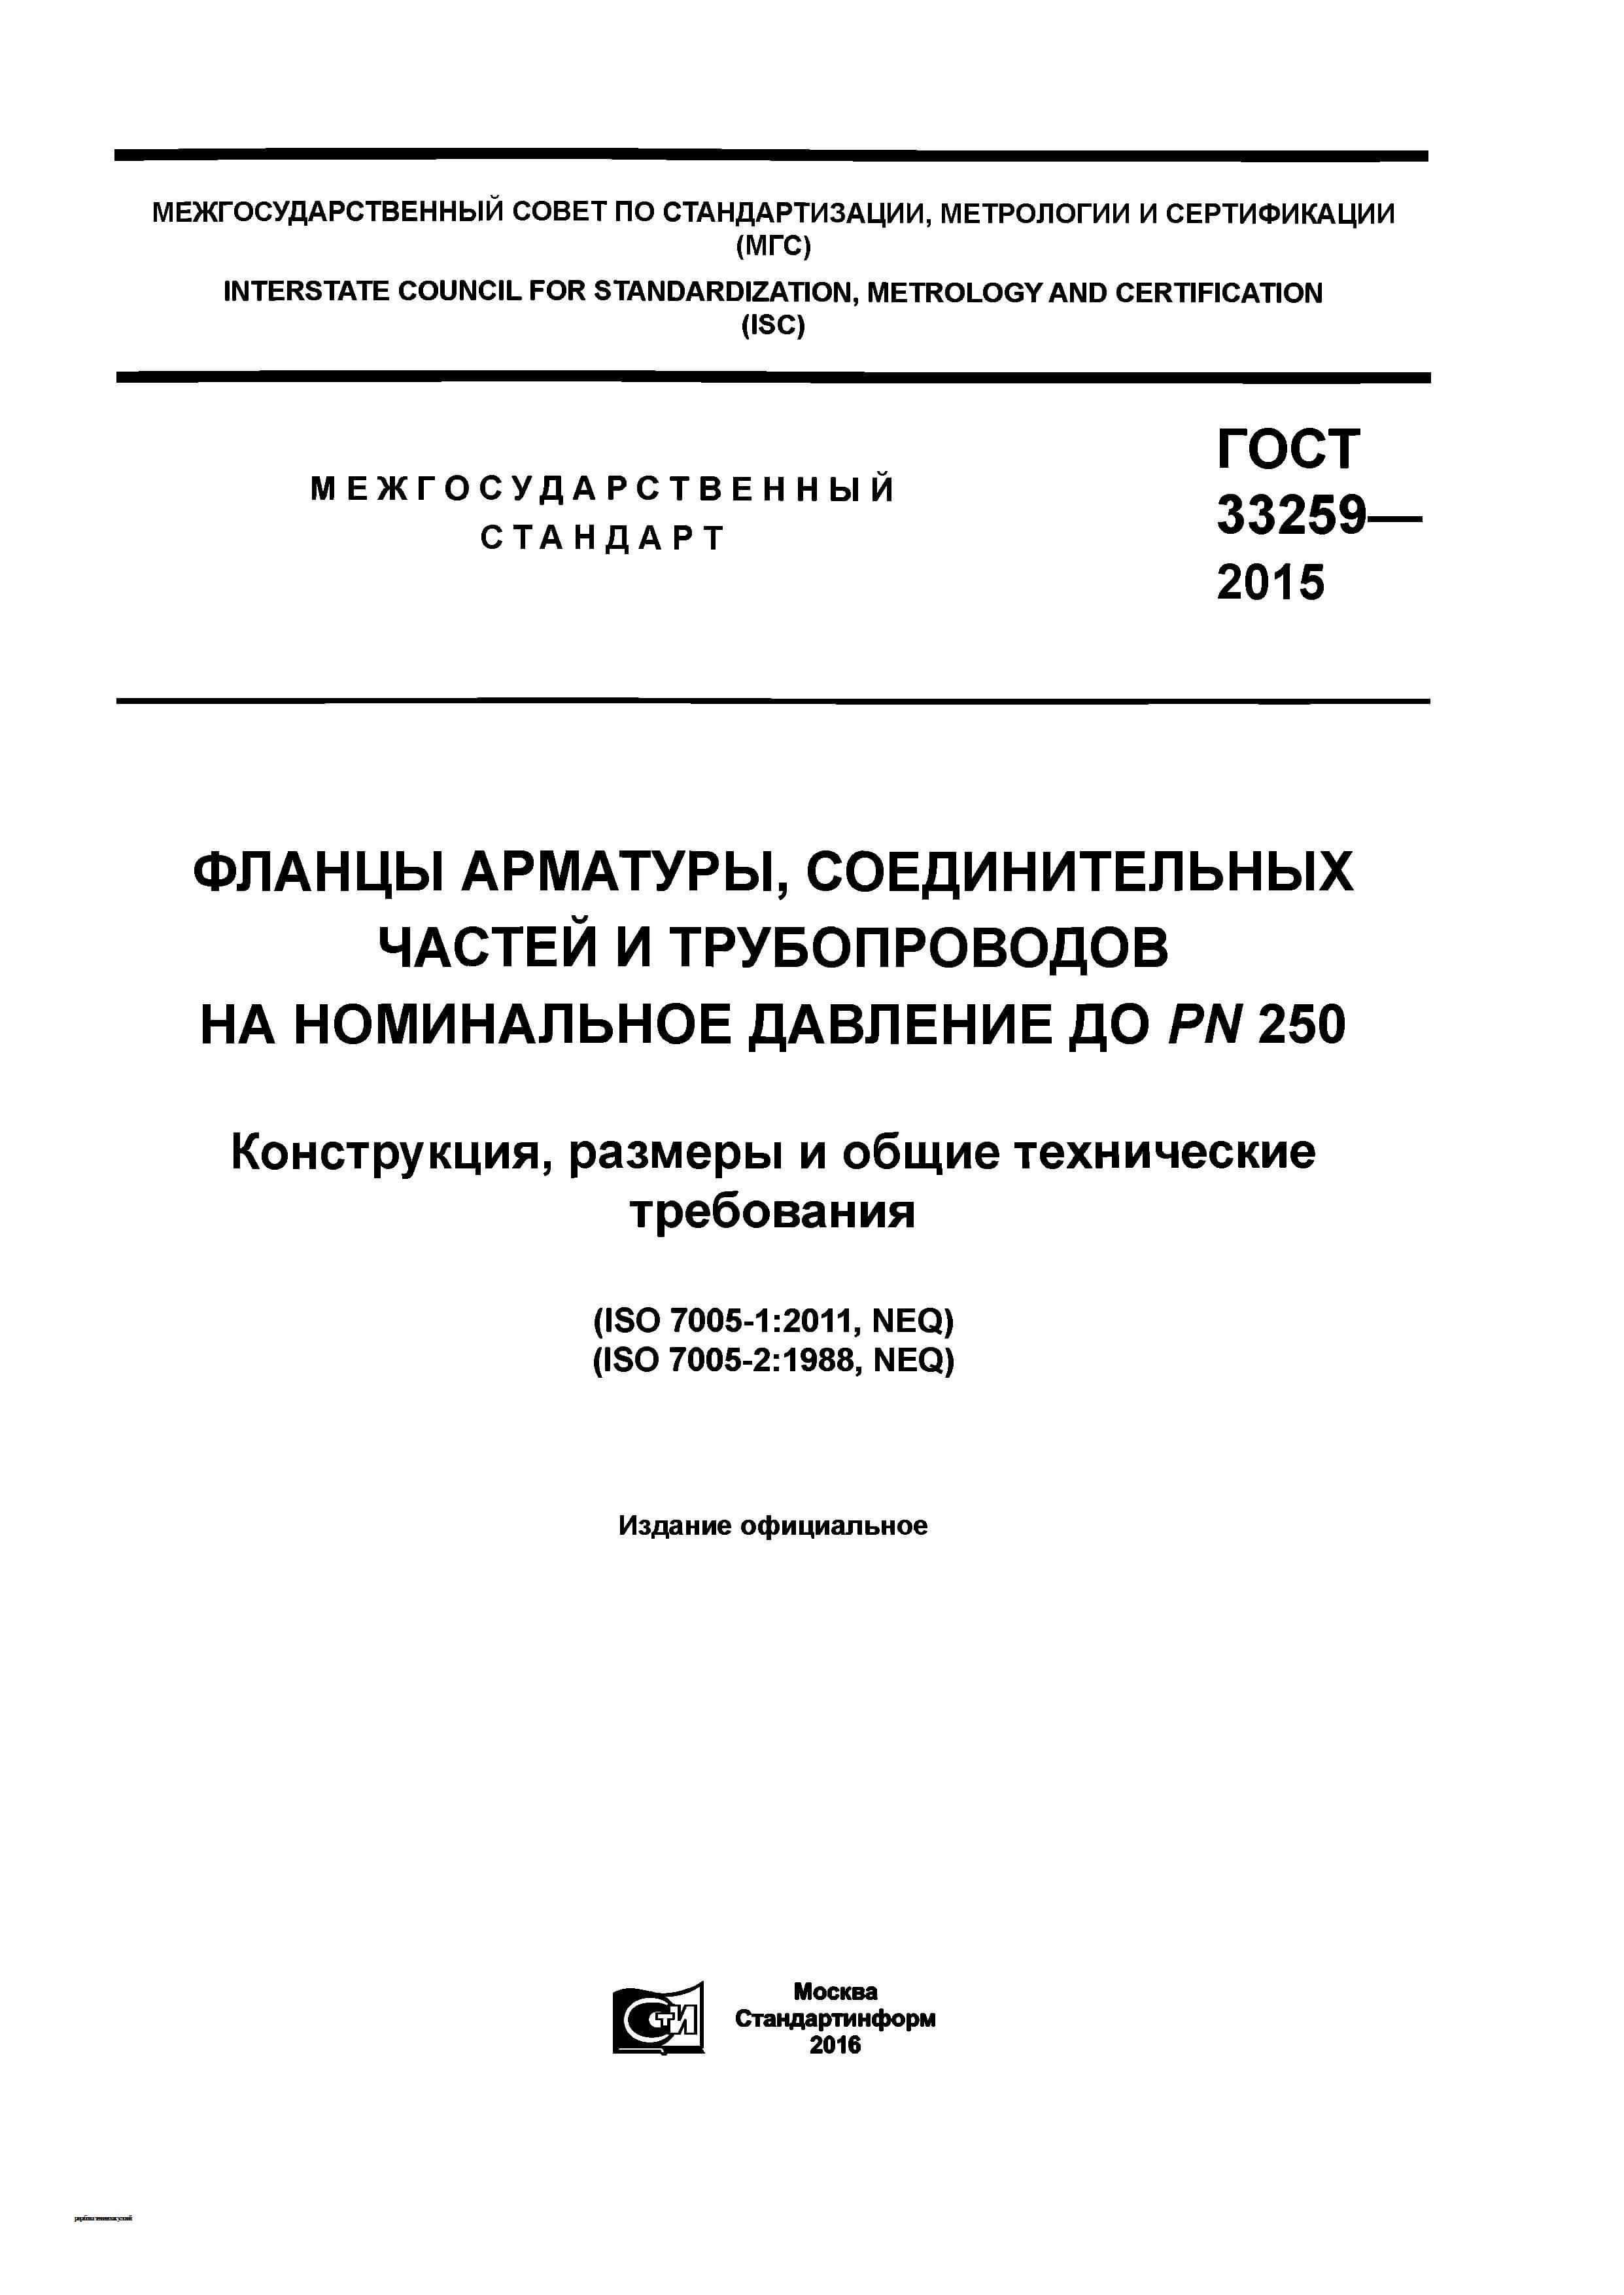 ГОСТ 33259-2015 на фланцы плоские